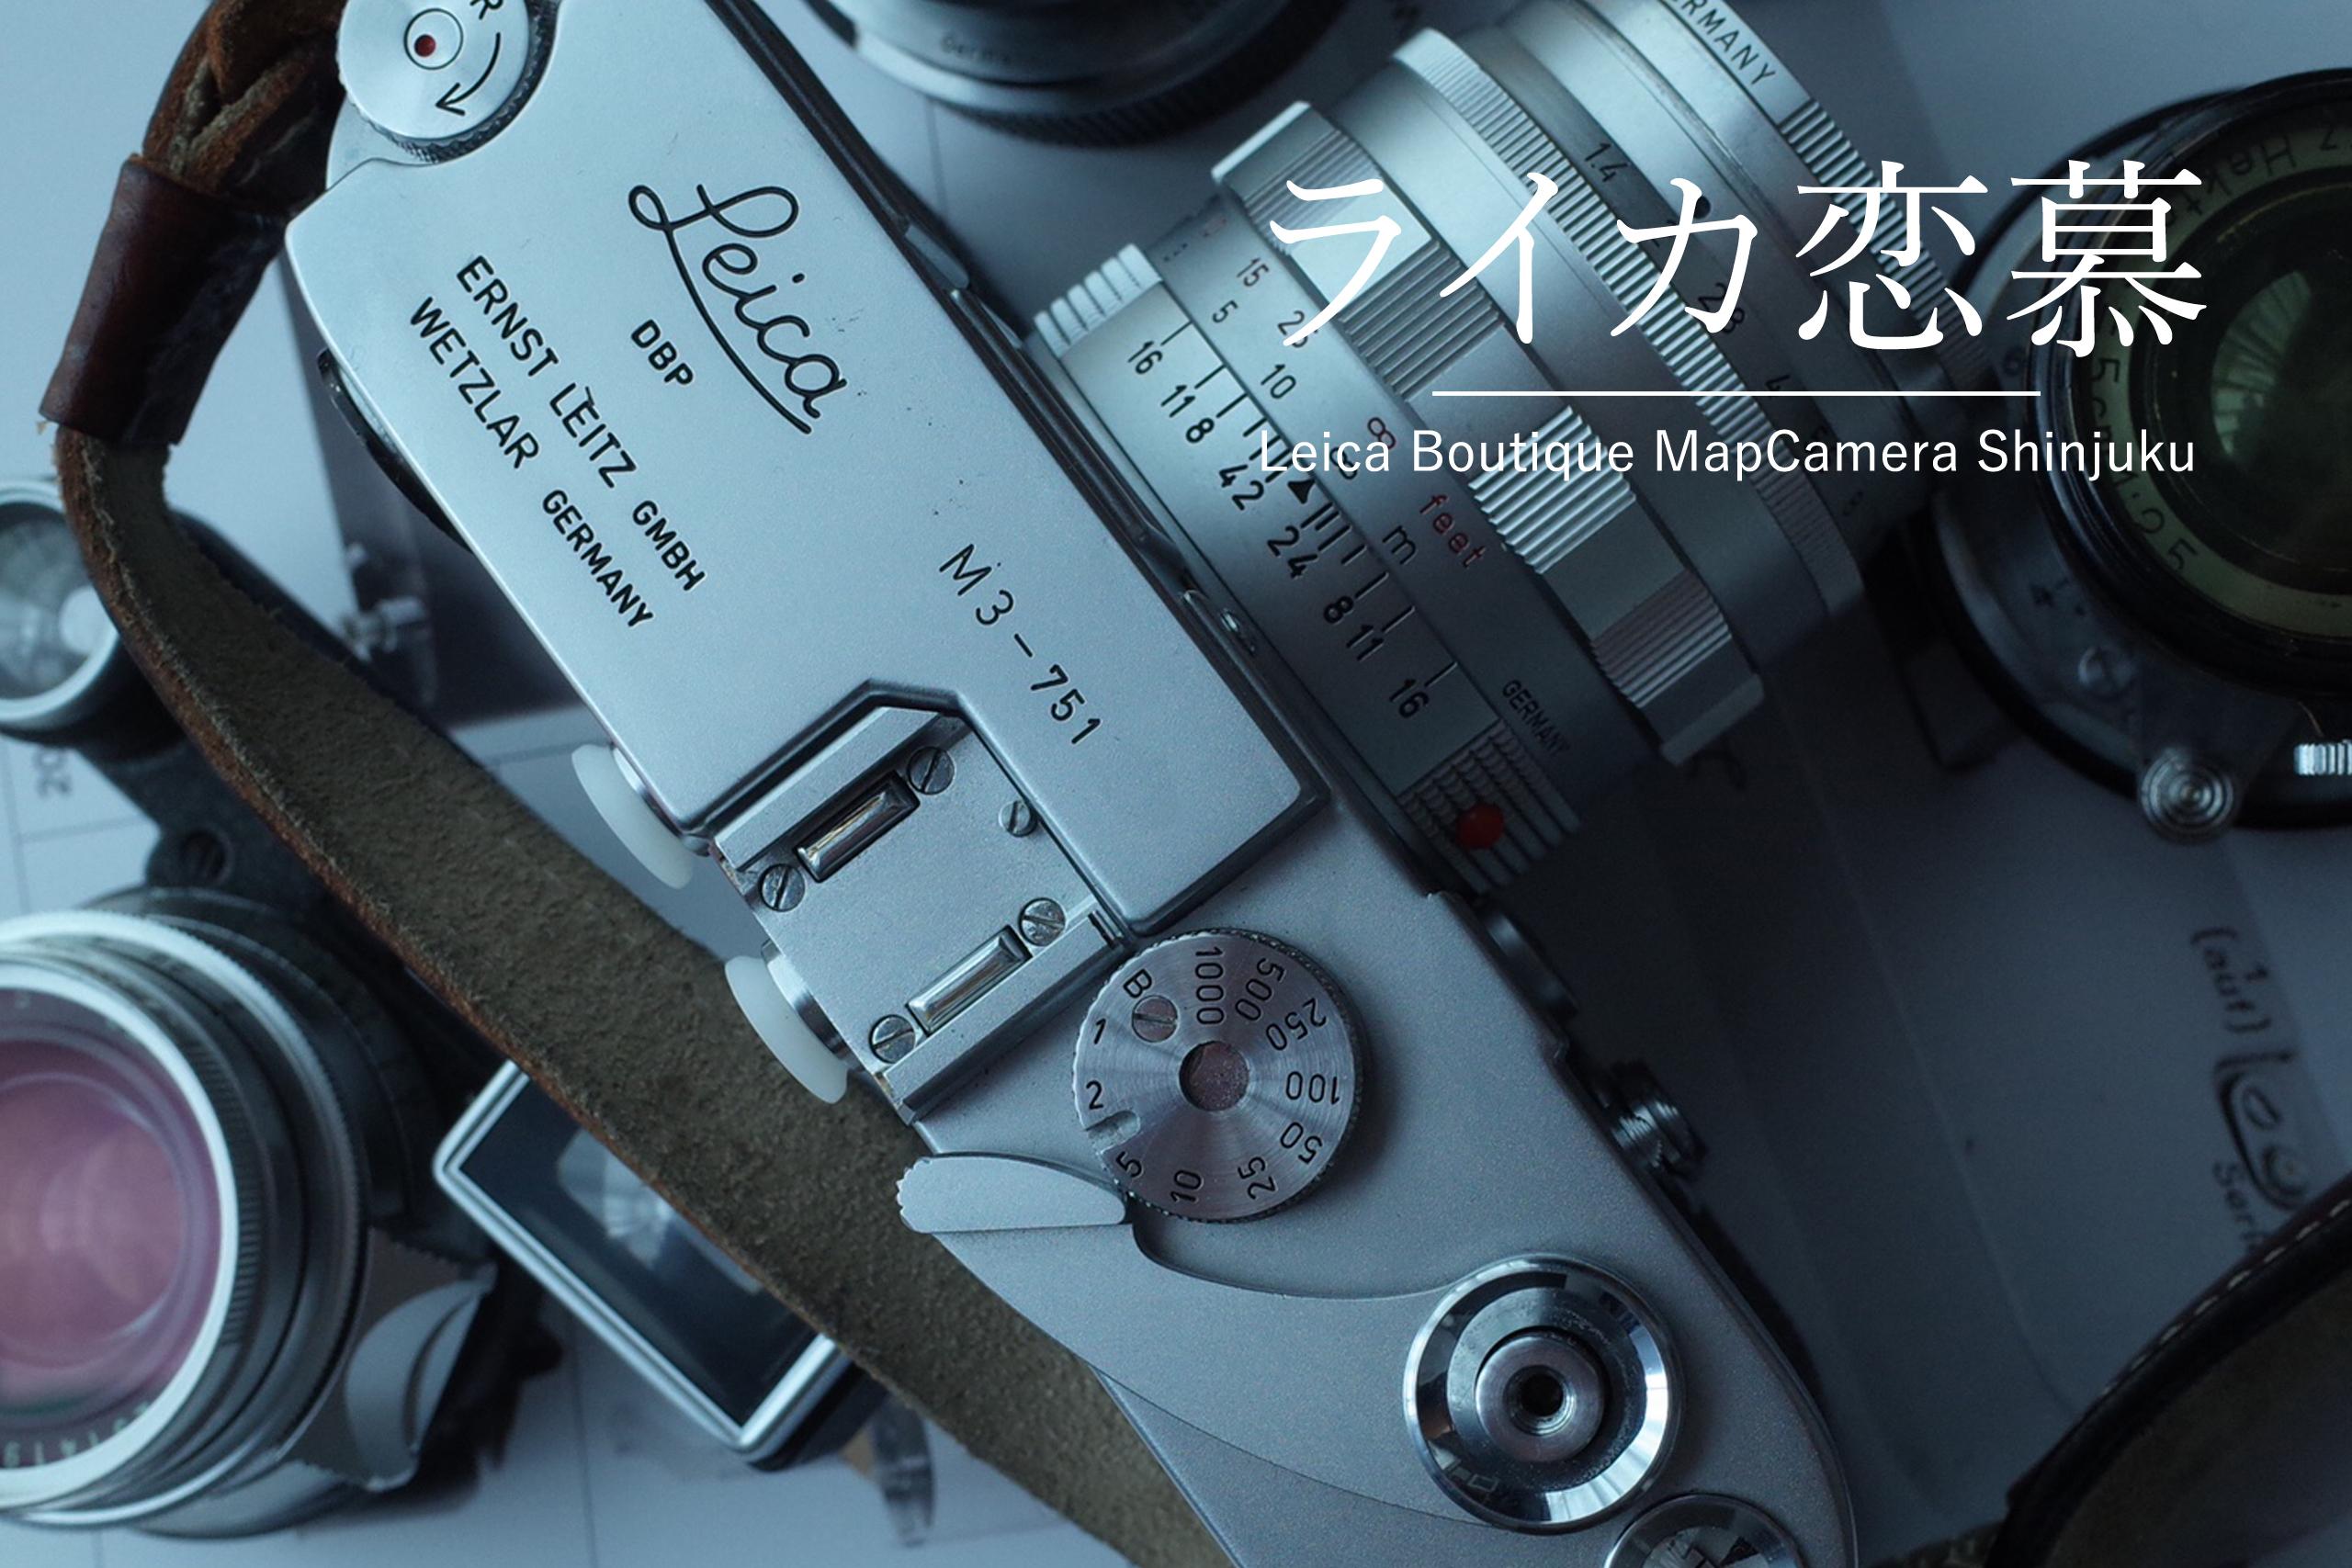 【Leica Boutique MapCamera Shinjuku 8th】私のLeicaCCD機とM3愛